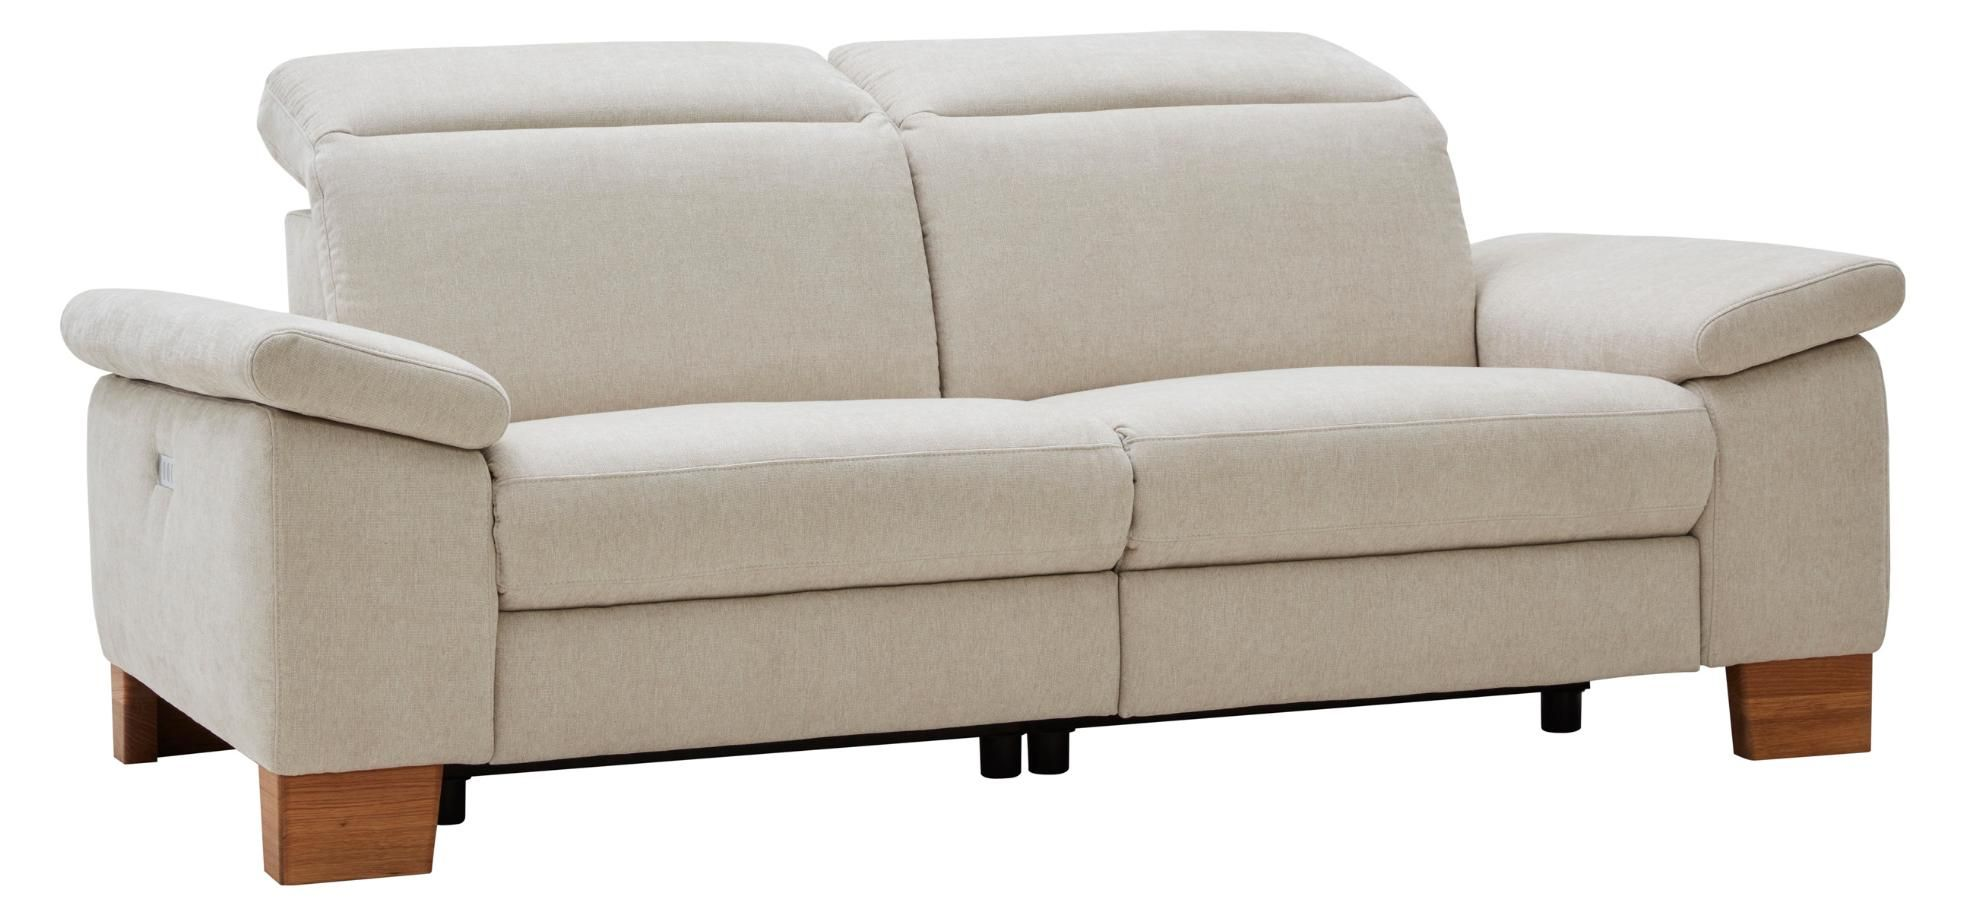 Kleines 3 Sitzer Sofa Natura Michigan In Creme Farbenem Stoff Berkemeier Home Company In 2020 3 Sitzer Sofa Sofa Michigan